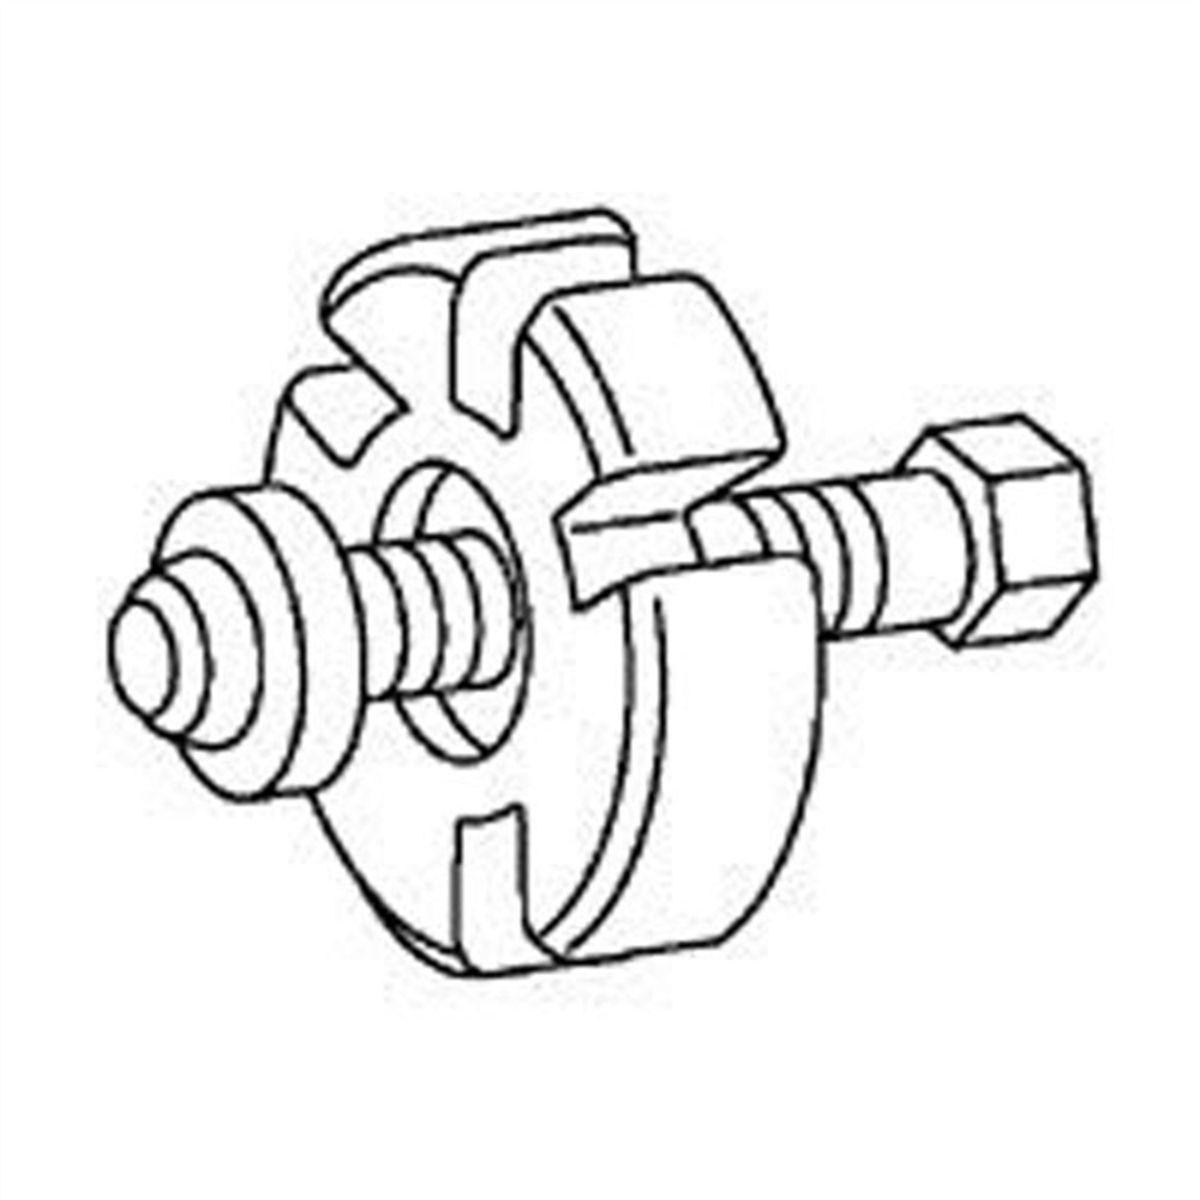 Crankshaft Vibration Damper Remover T58p D